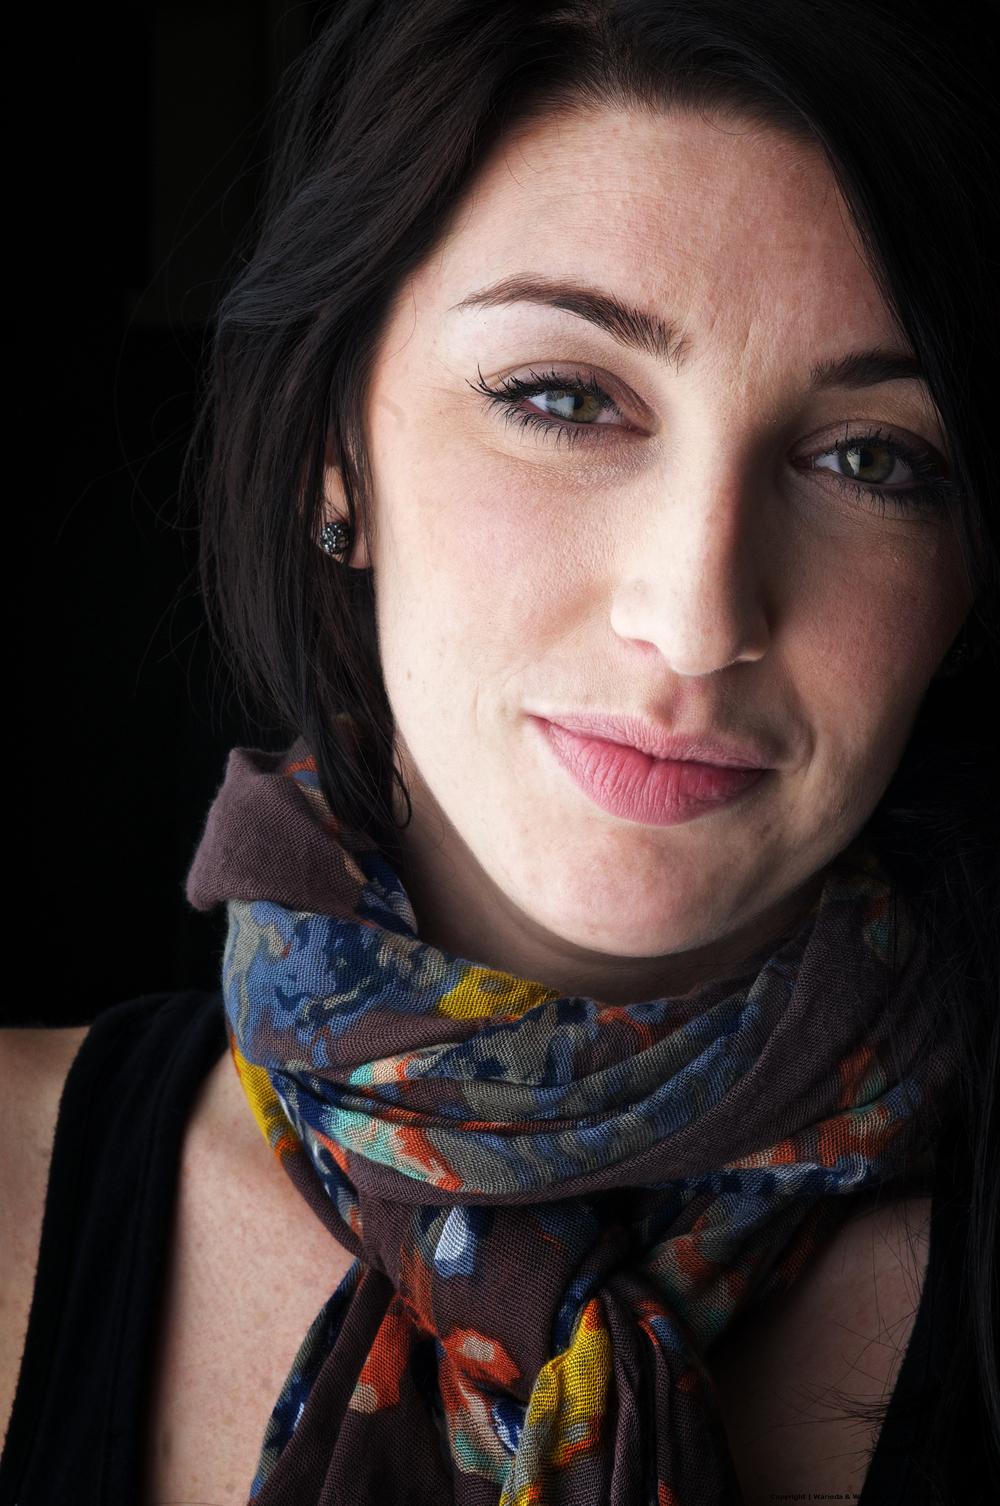 29042012 | Portraits | TESTING | Prolite 100 | Bowens | Julie_2012-04-28_23-56-24_REX_7735_©Warioda_2012 - Version 2.jpg